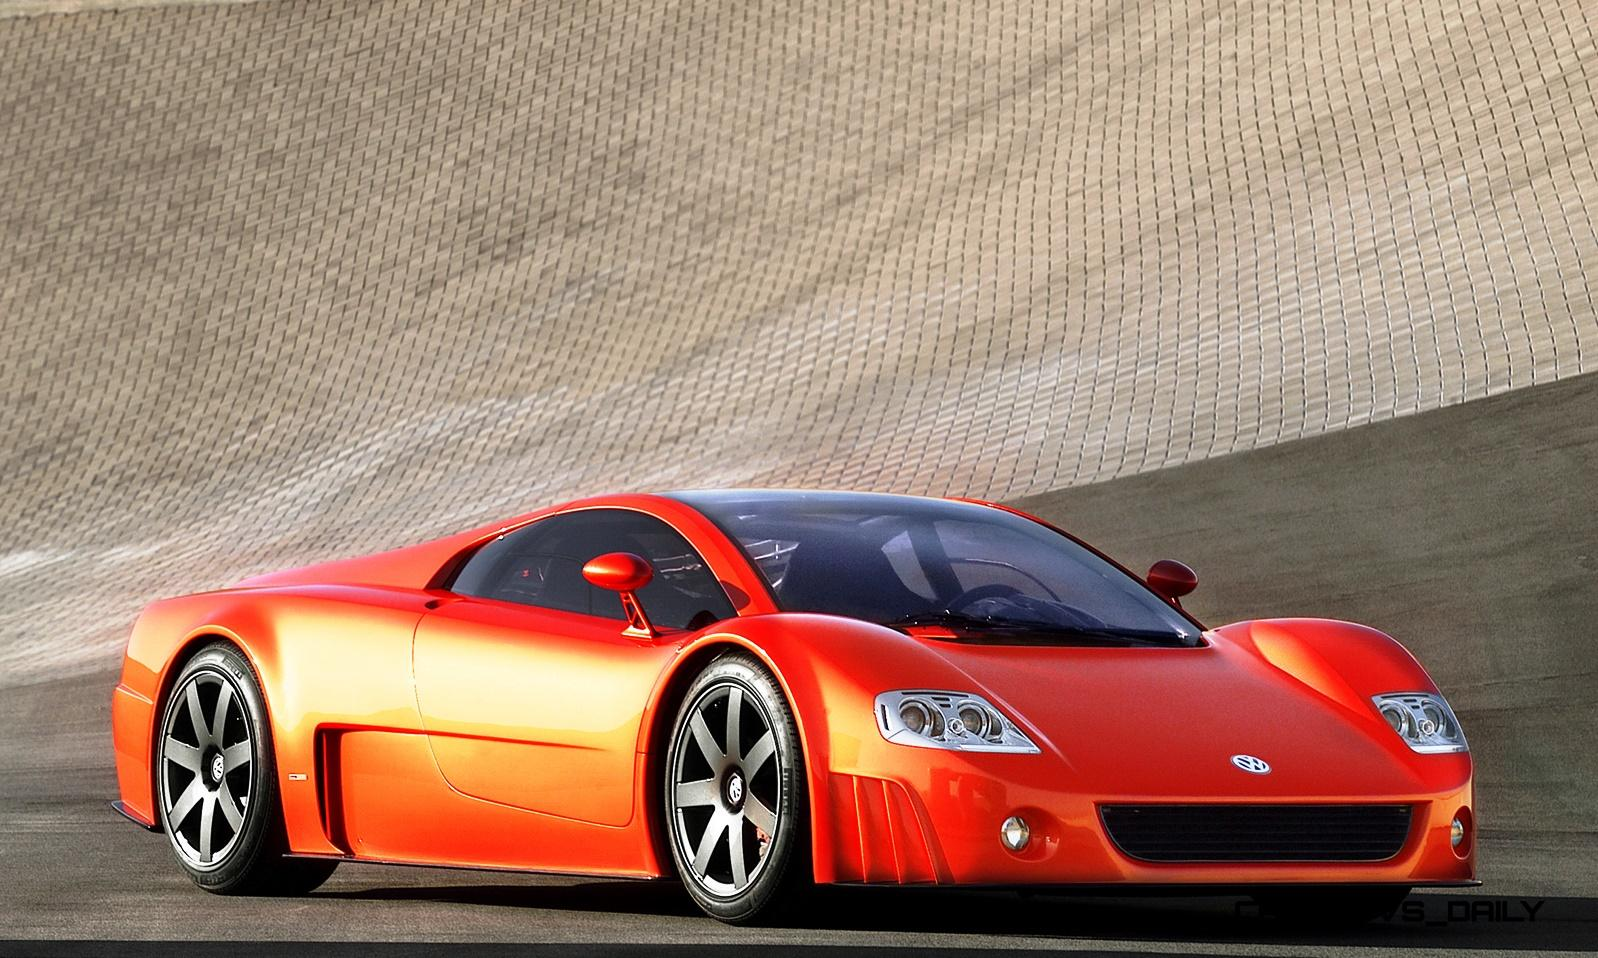 2001-Volkswagen-W12-Coupe-Concept-Introd